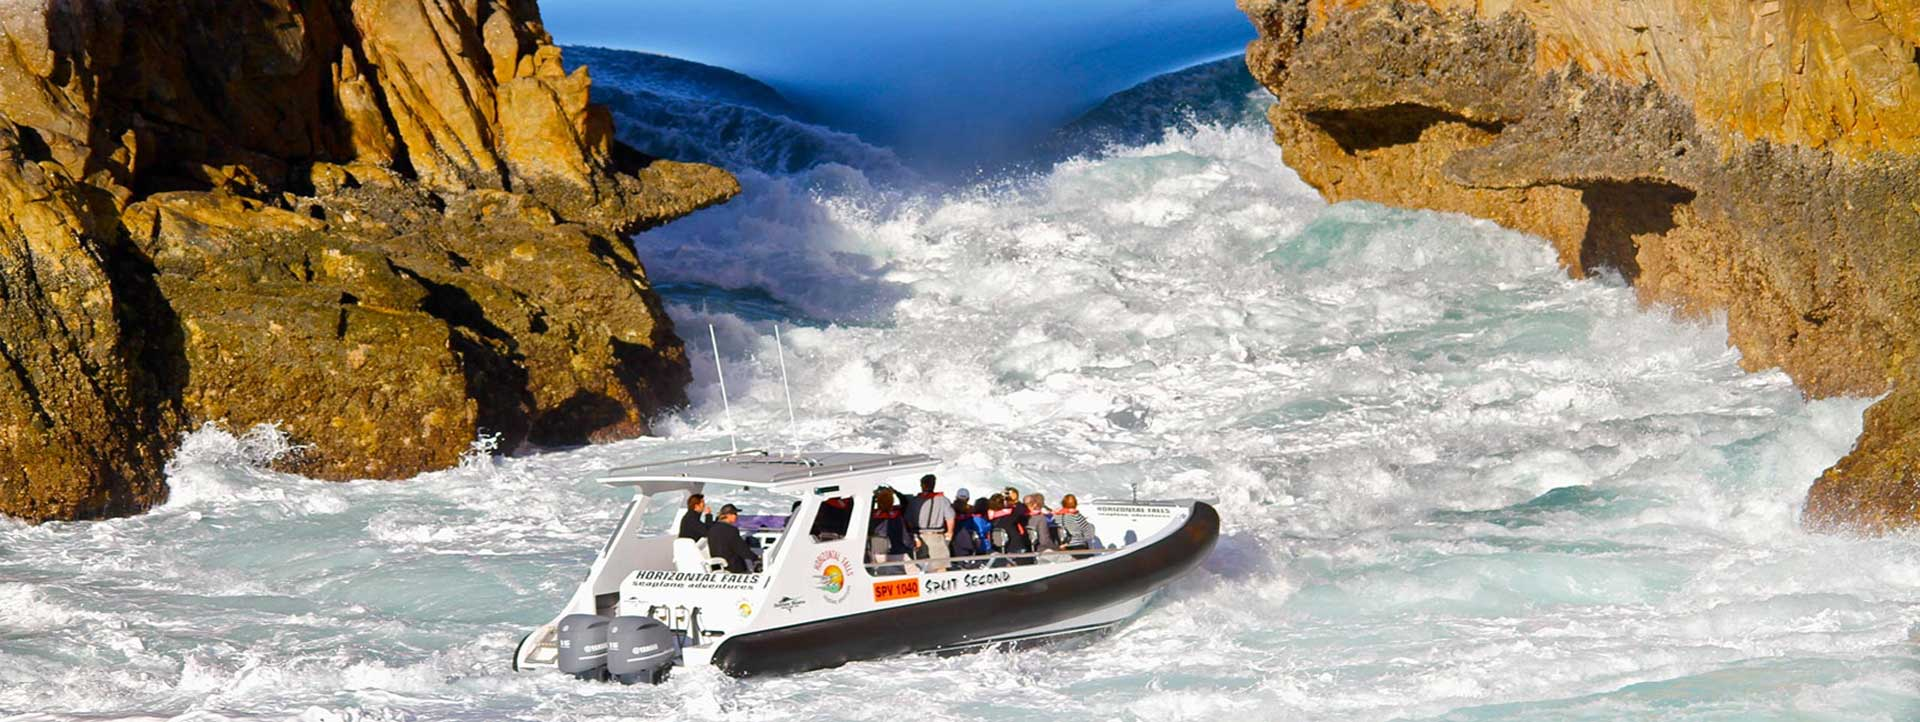 HORIZONTAL-FALLS-SEAPLANE-ADVENTURES-boat-fast-jetboat